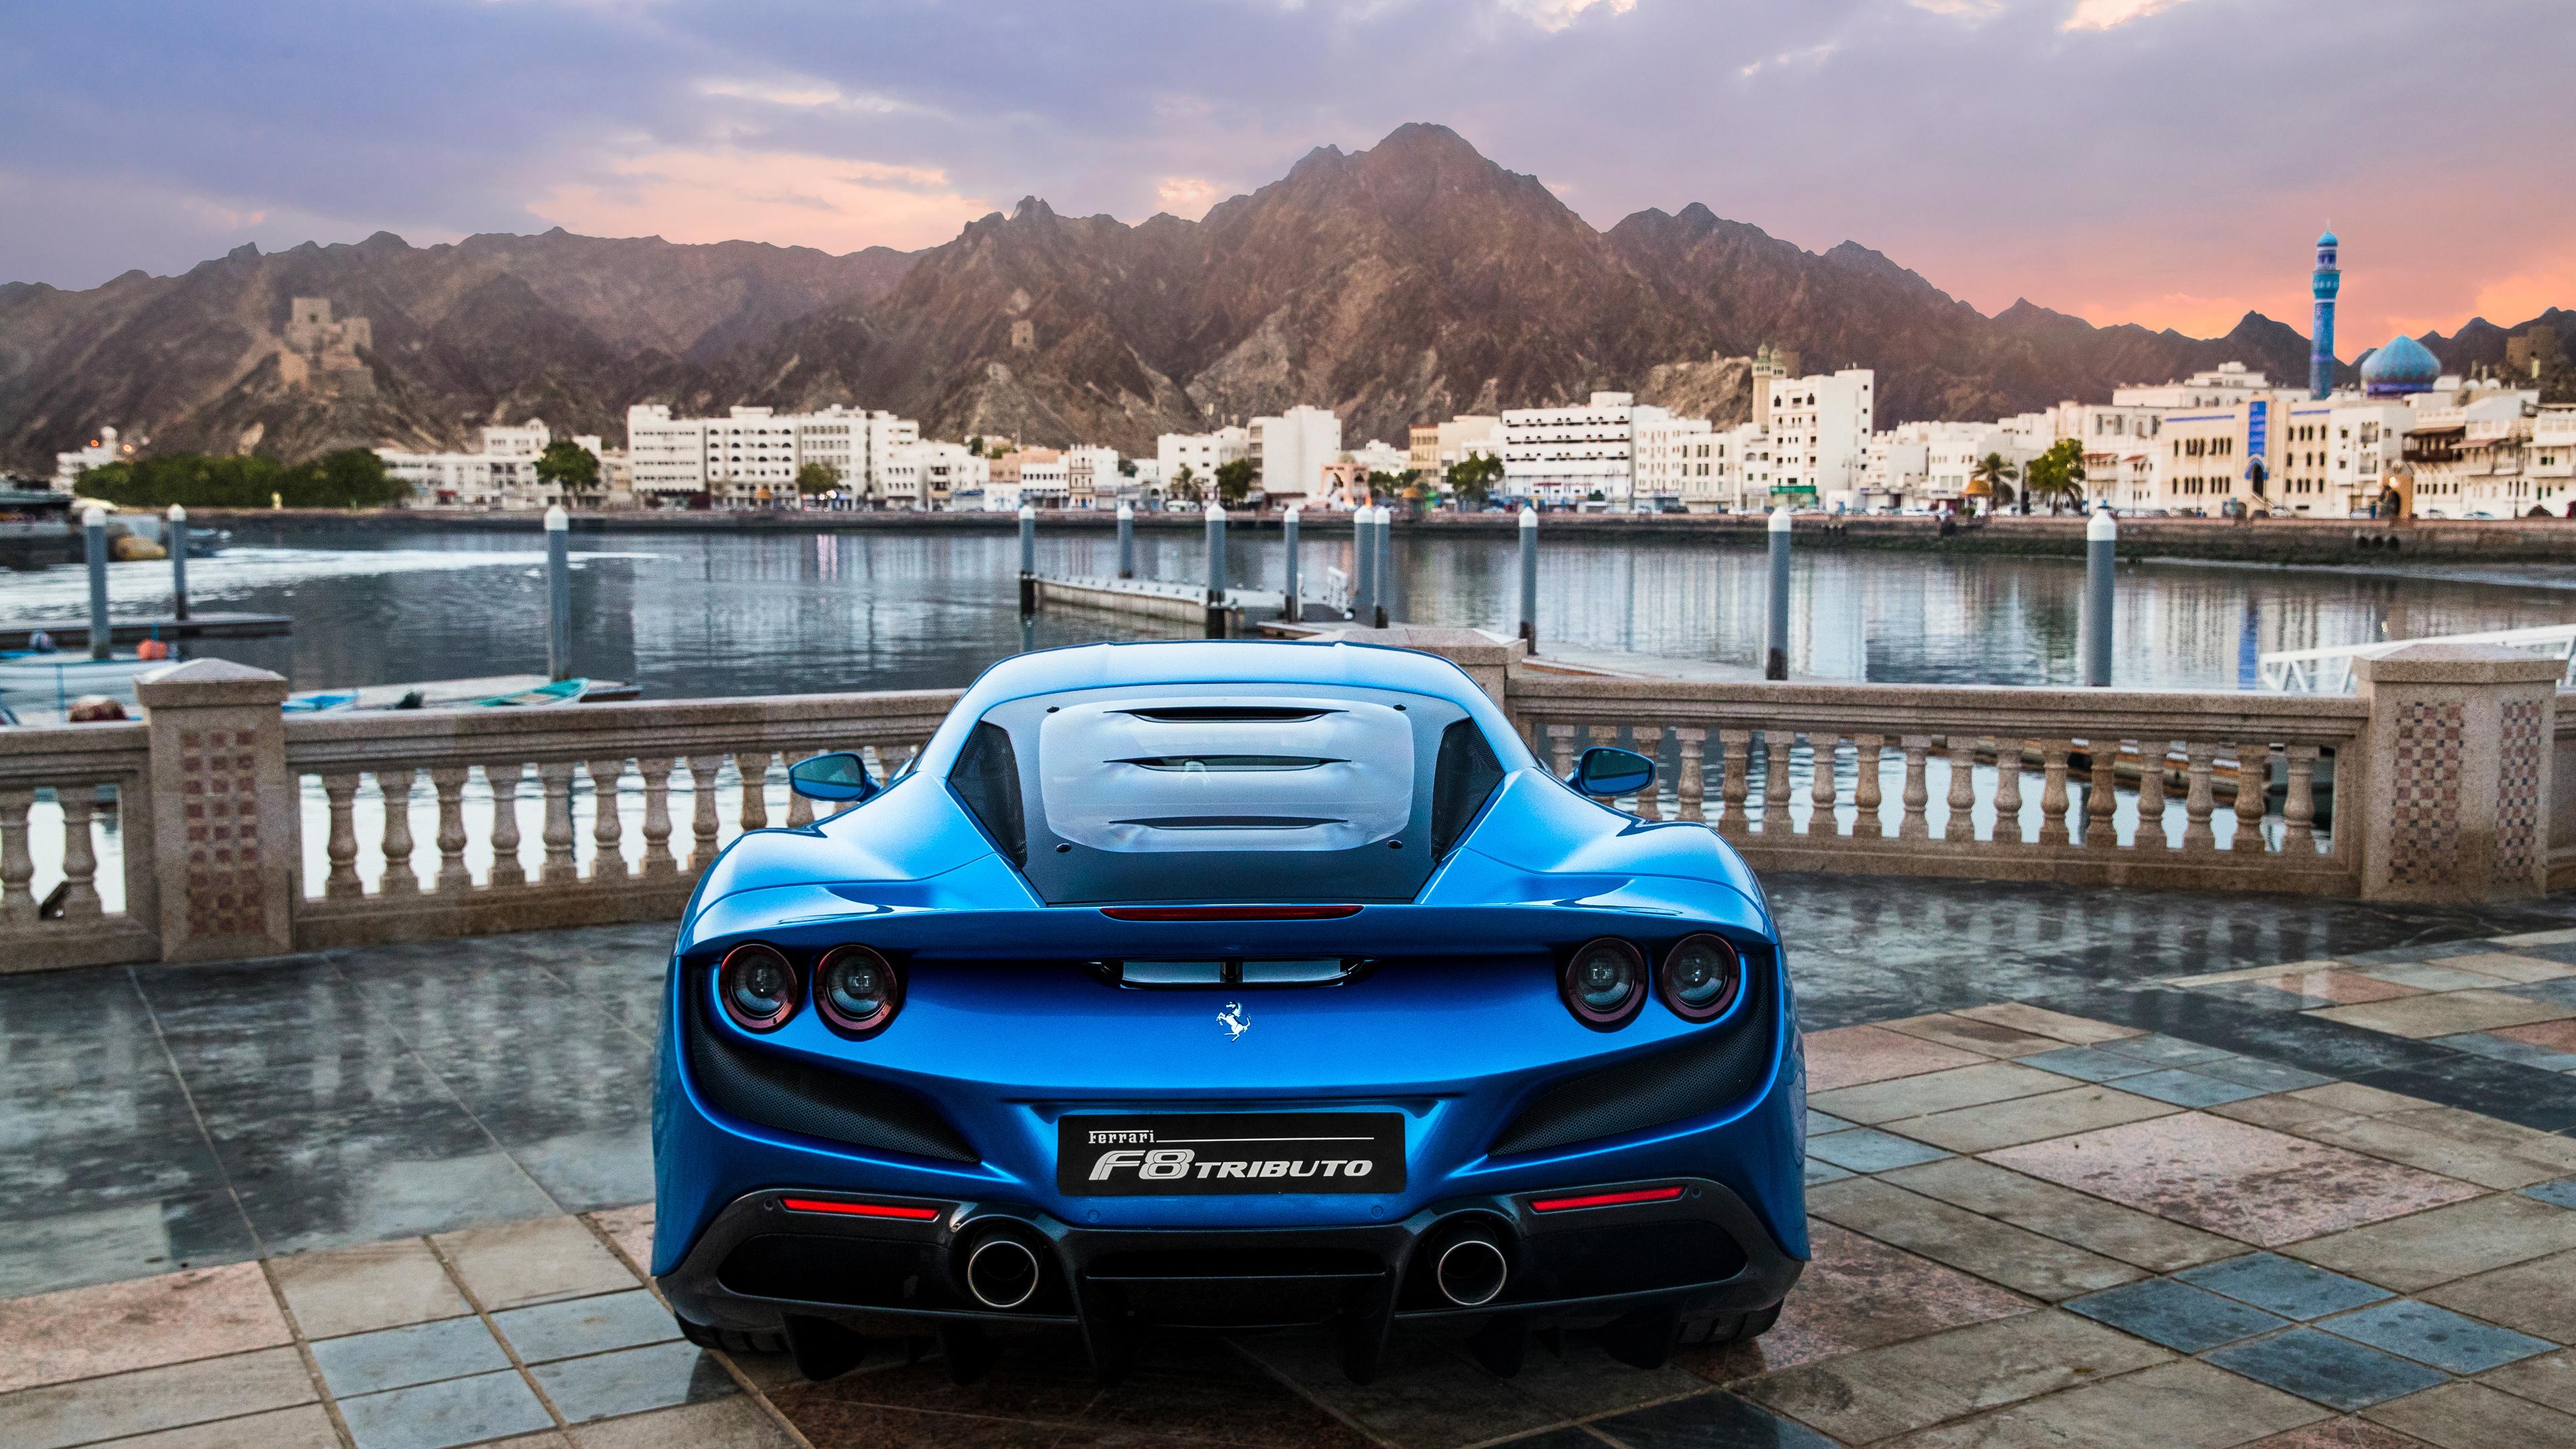 blue ferrari f8 tributo 2018 1557260849 - Blue Ferrari F8 Tributo 2018 - hd-wallpapers, ferrari wallpapers, ferrari f8 tributo wallpapers, cars wallpapers, 4k-wallpapers, 2019 cars wallpapers